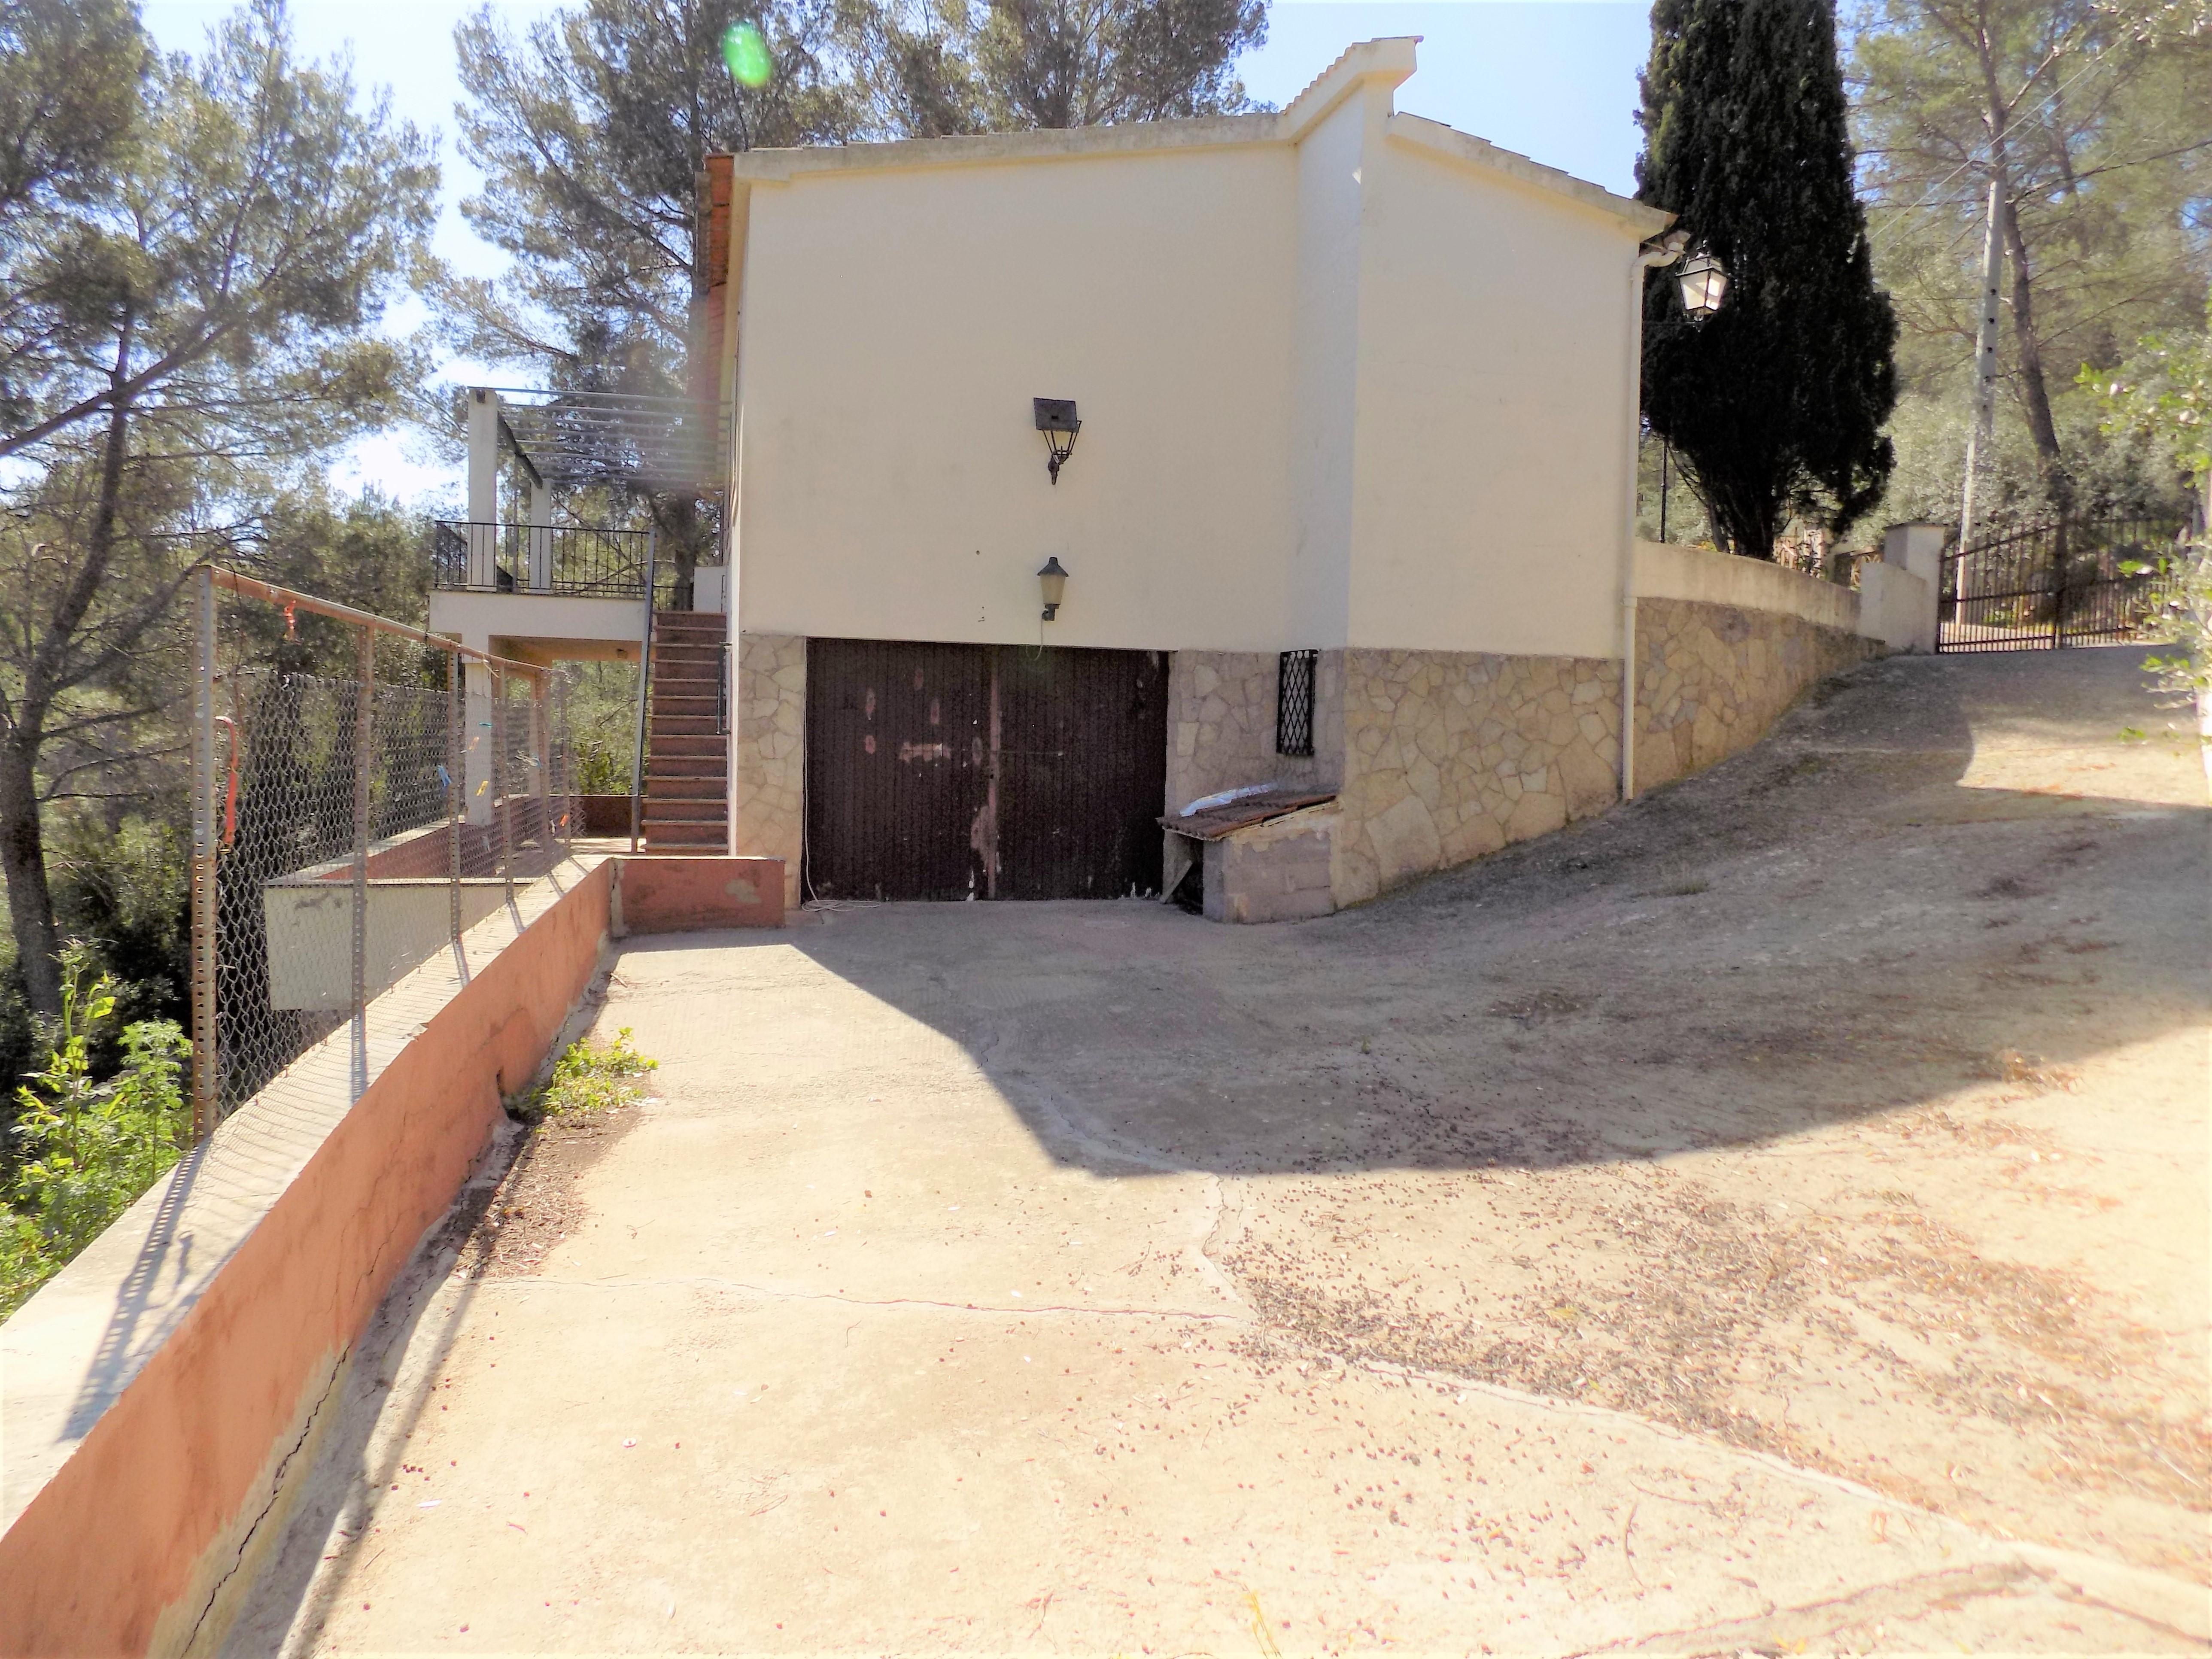 Villa at Esporles to reform